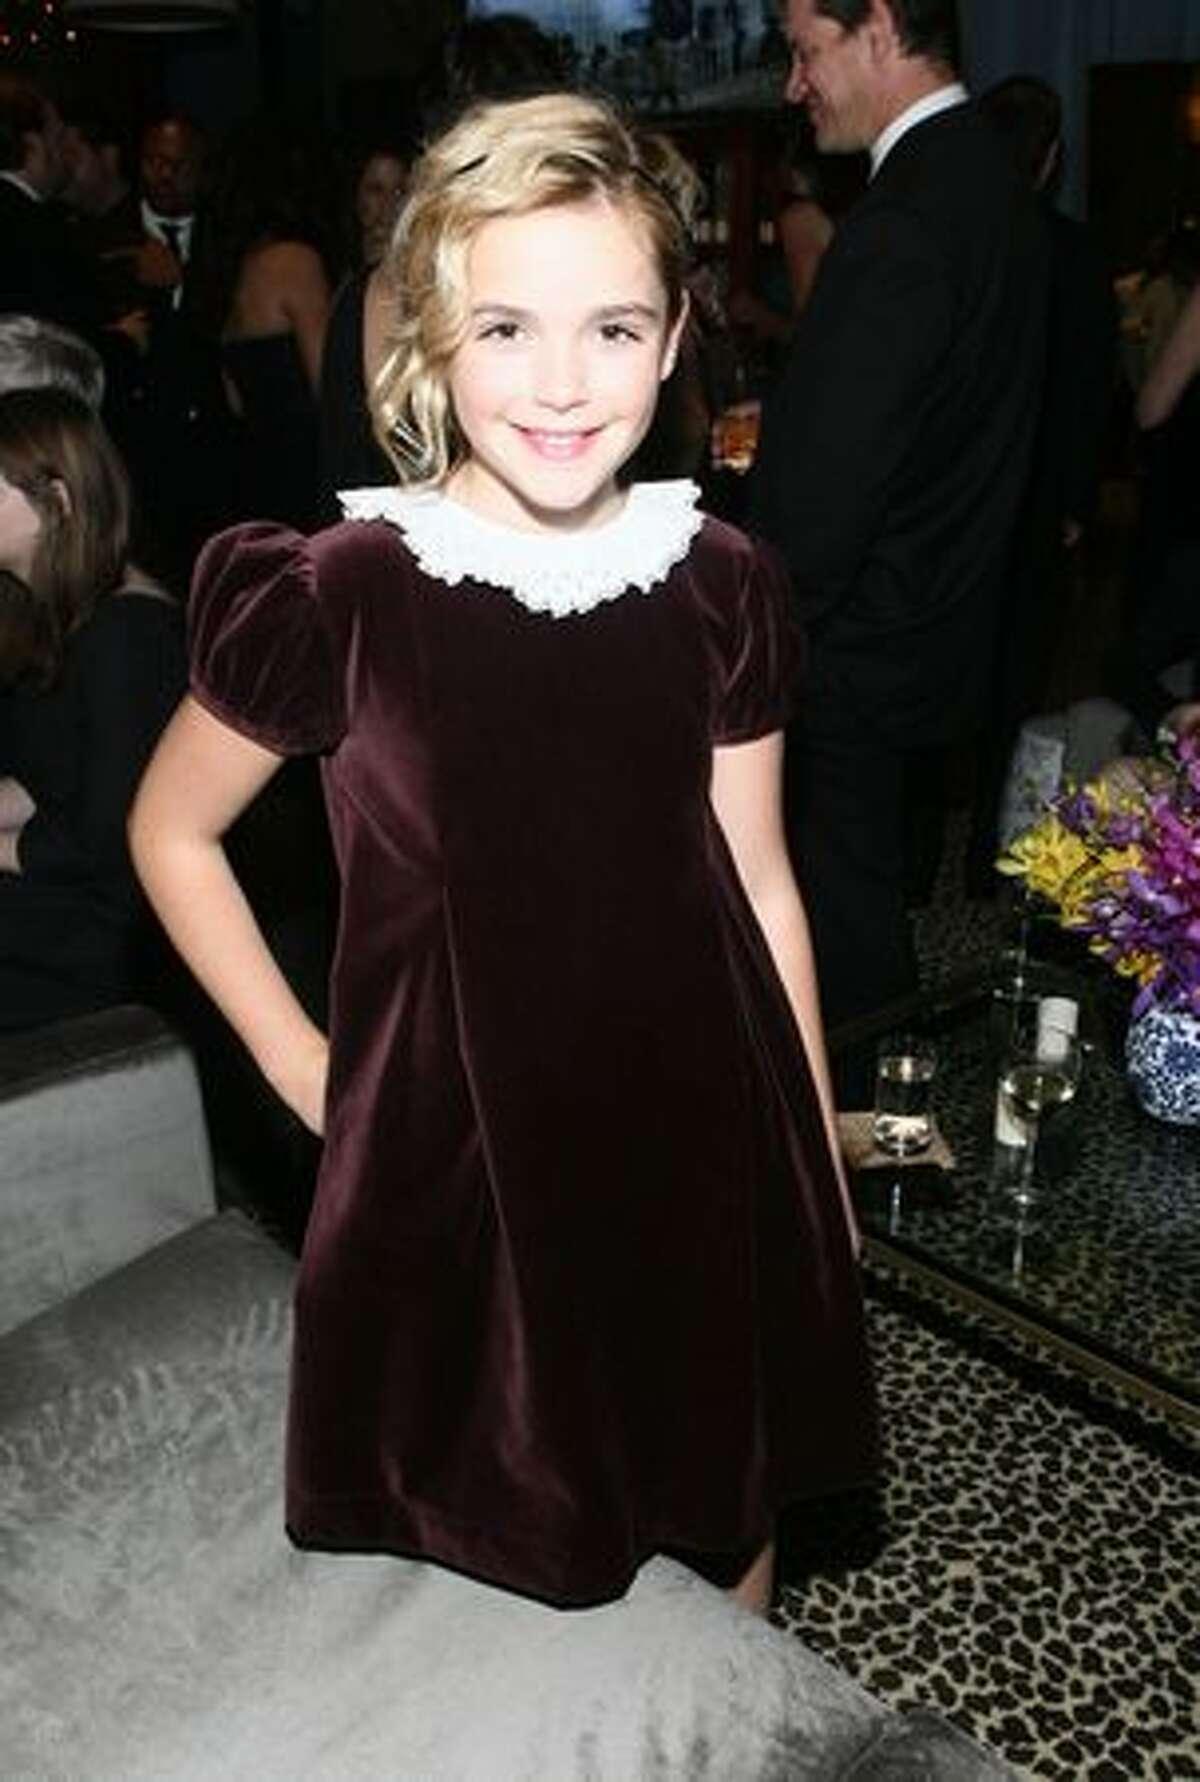 Actress Kiernan Shipka attends AMC's 2011 Golden Globe Awards Party.